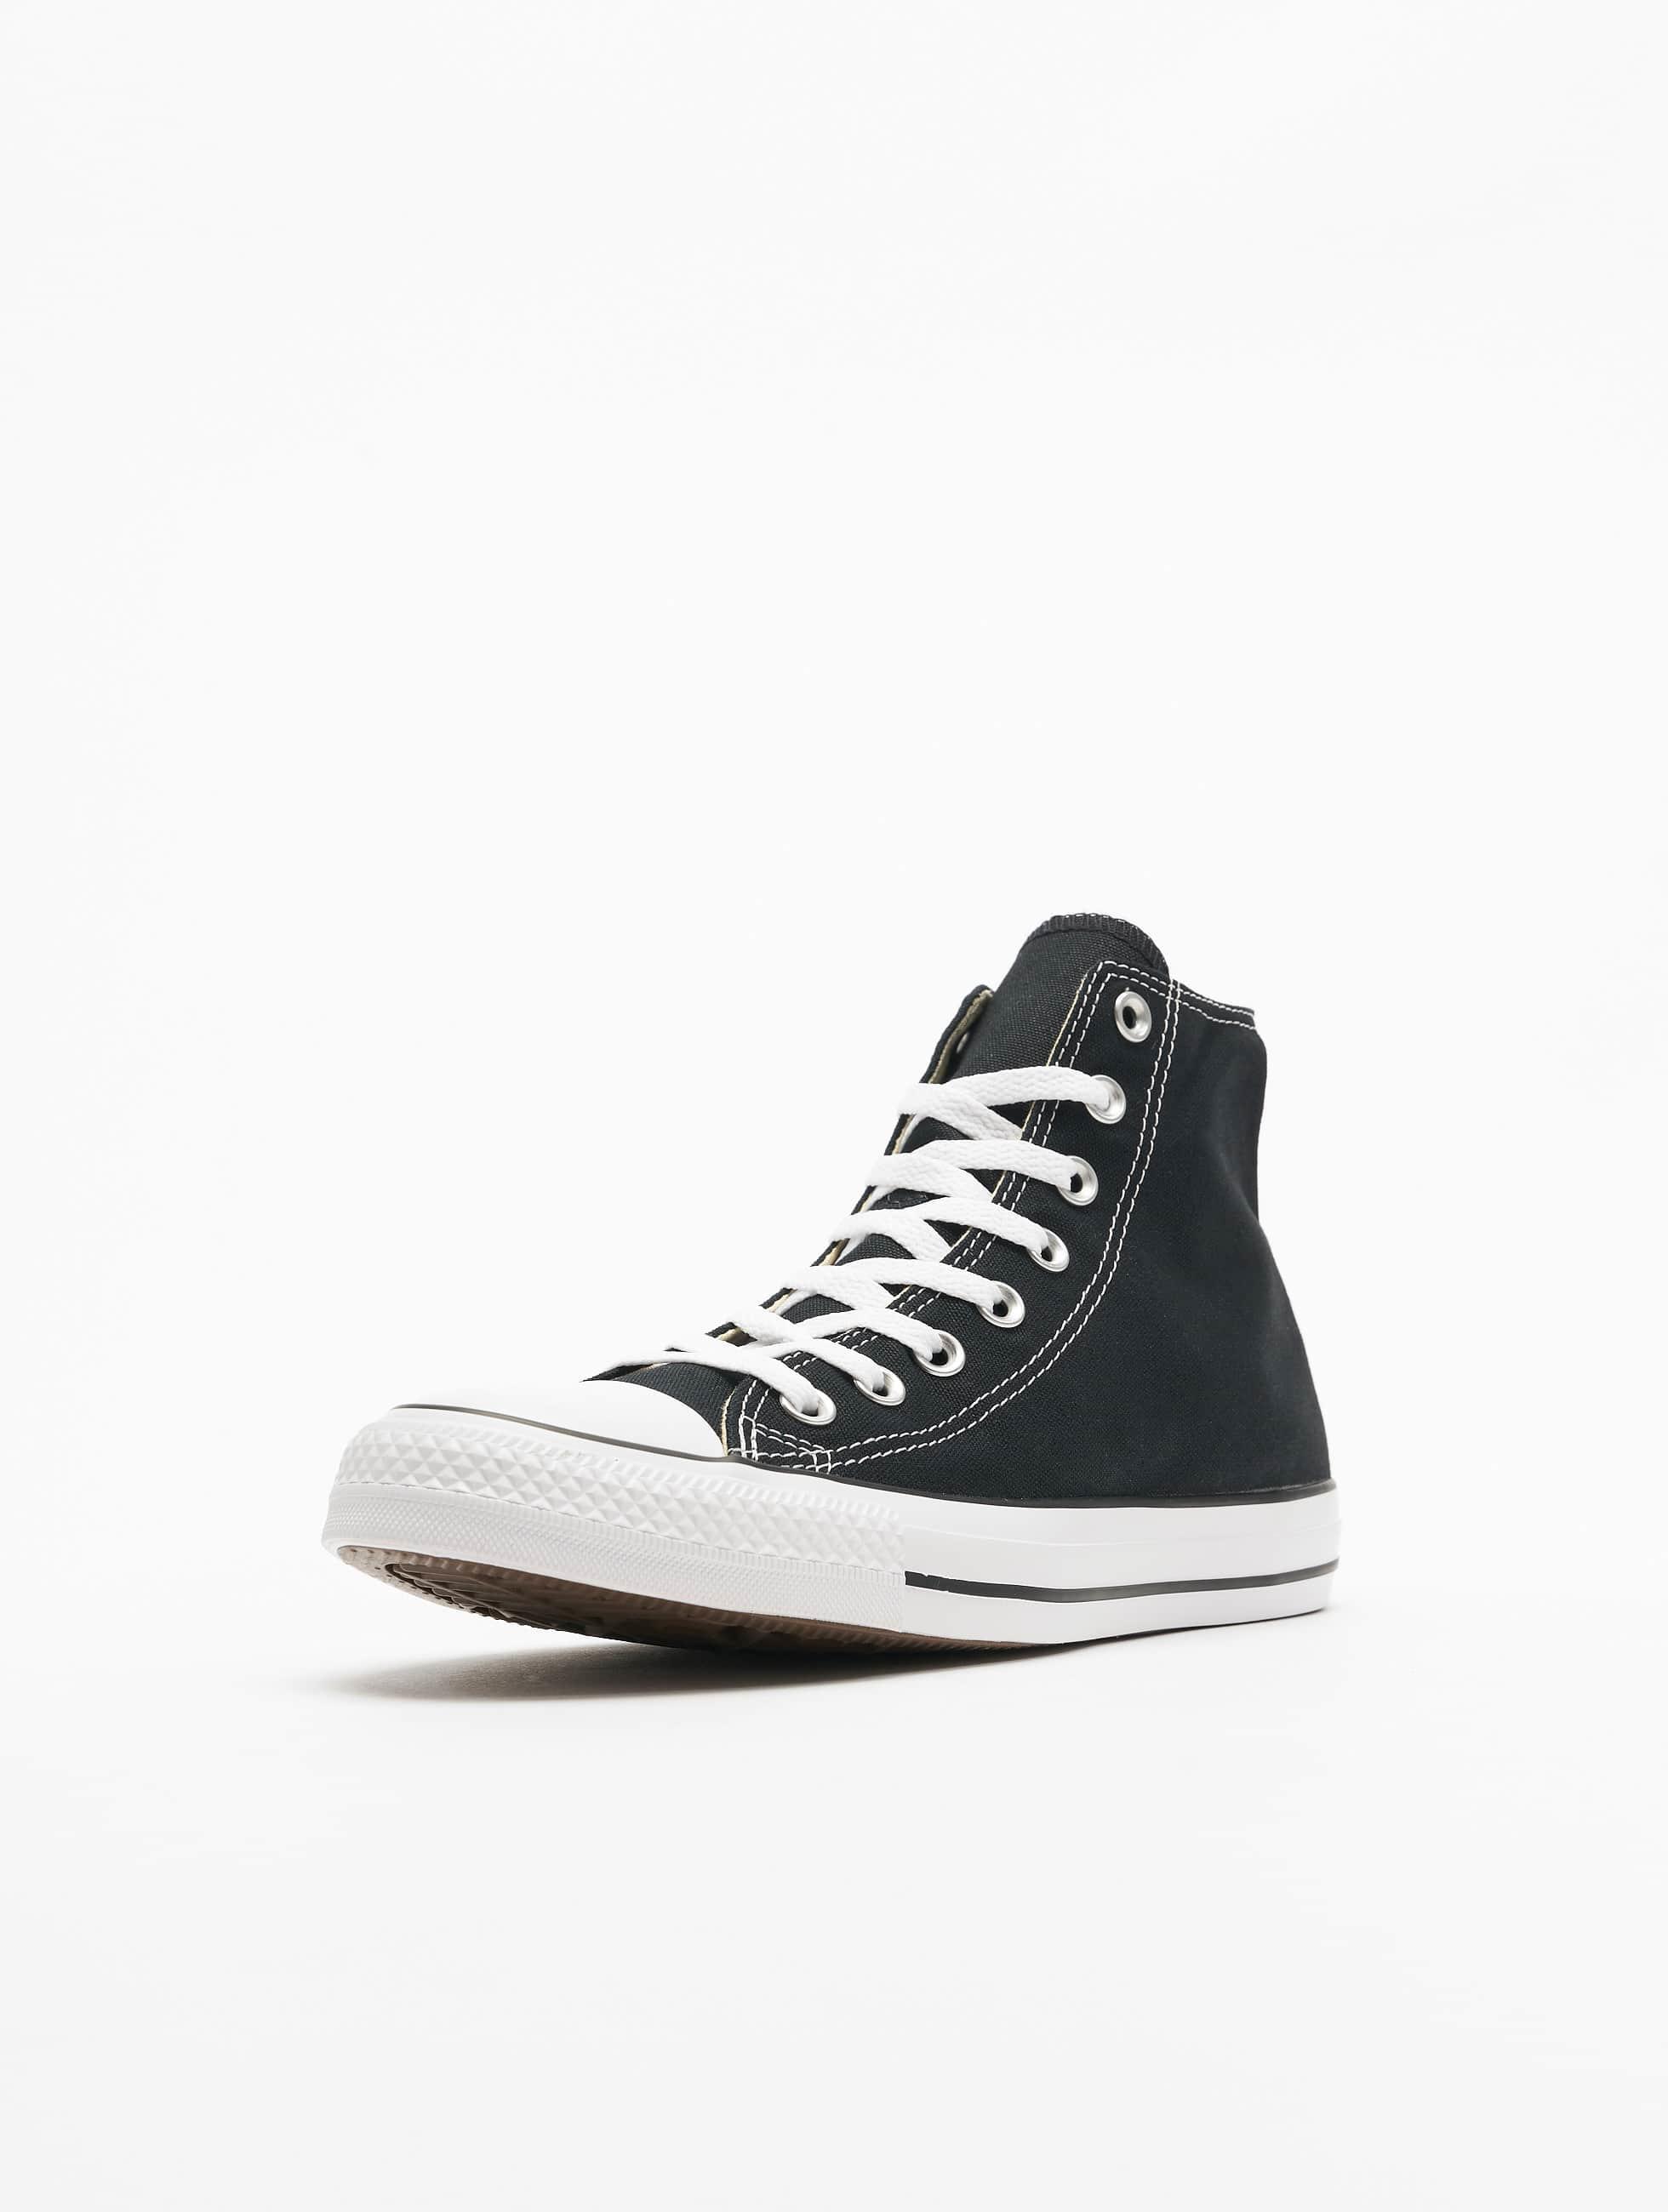 Converse Herren Sneaker All Star High Chucks In Schwarz